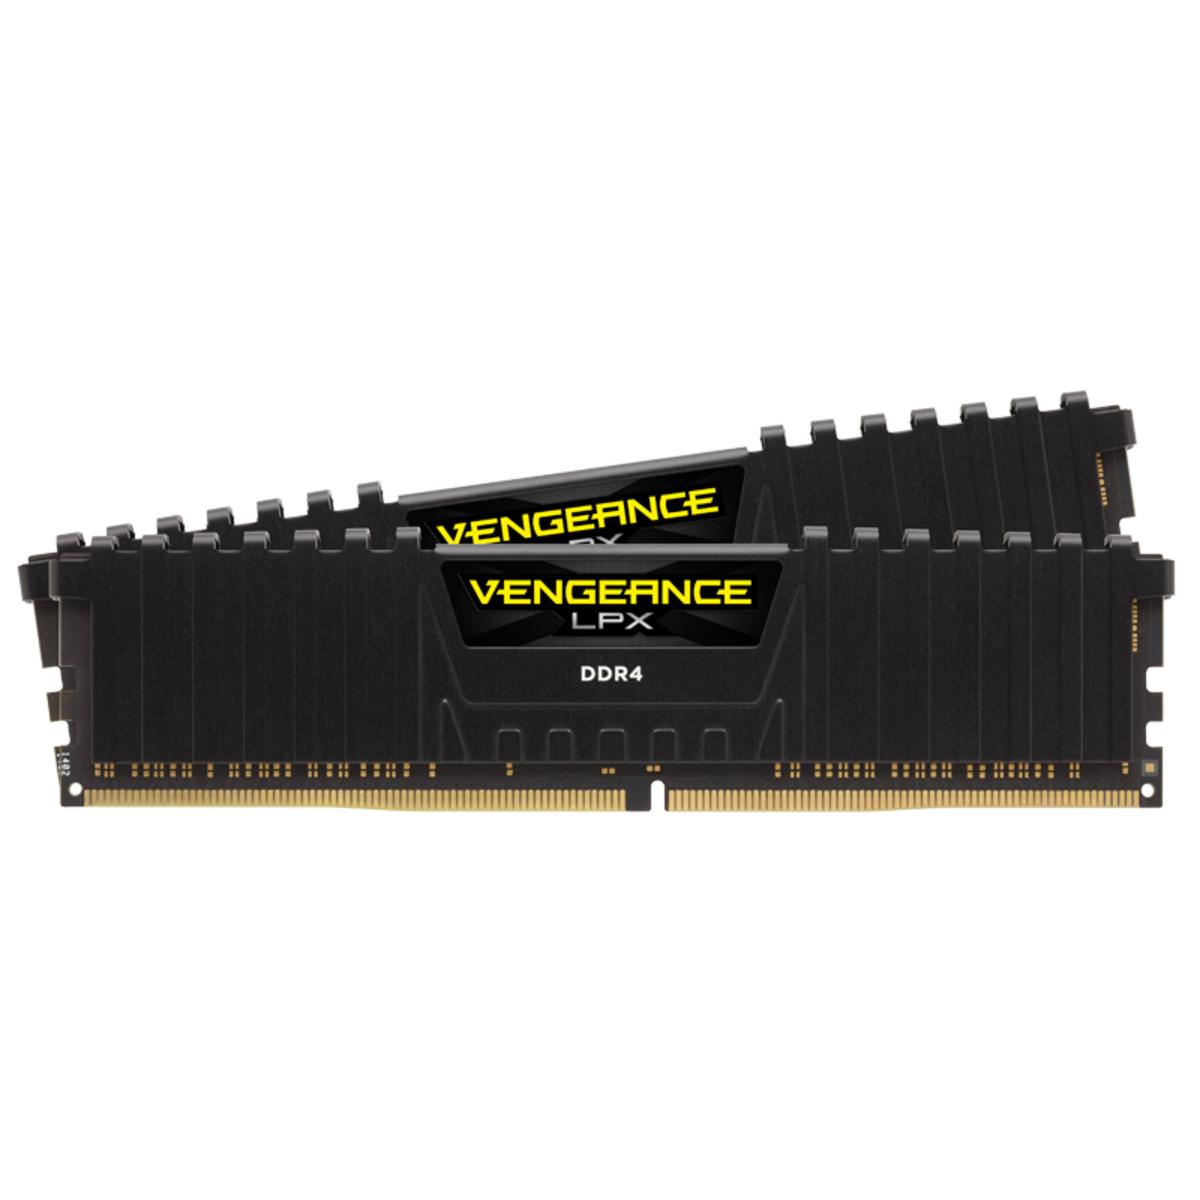 Corsair Vengeance 32GB (2x16GB) DDR4 3600MHz C18 XMP 2.0